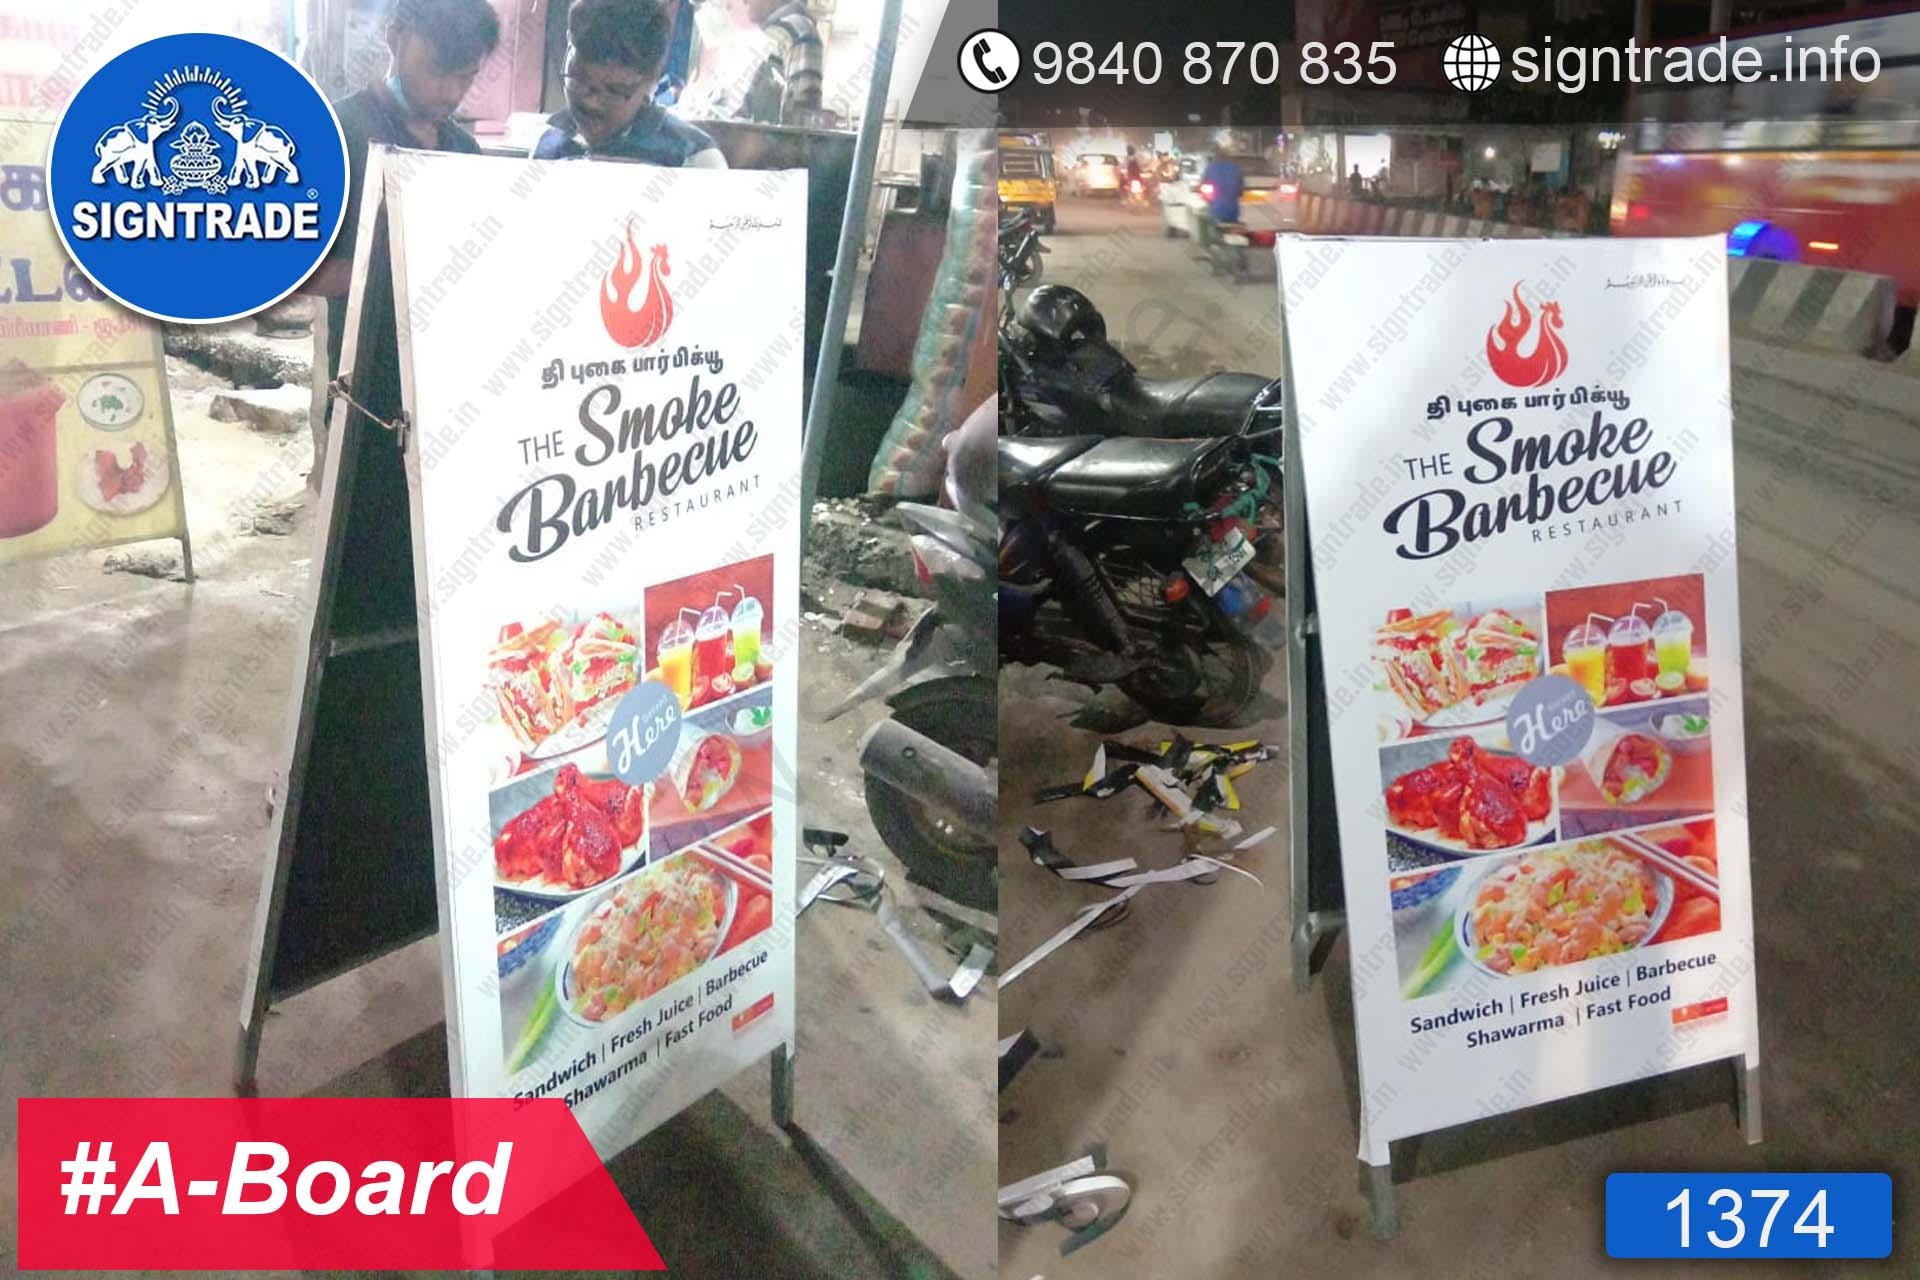 The Smoke Barbeque - Chennai - SIGNTRADE - A-Board - Frontlit Flex Board - Digital Printing Services in Chennai